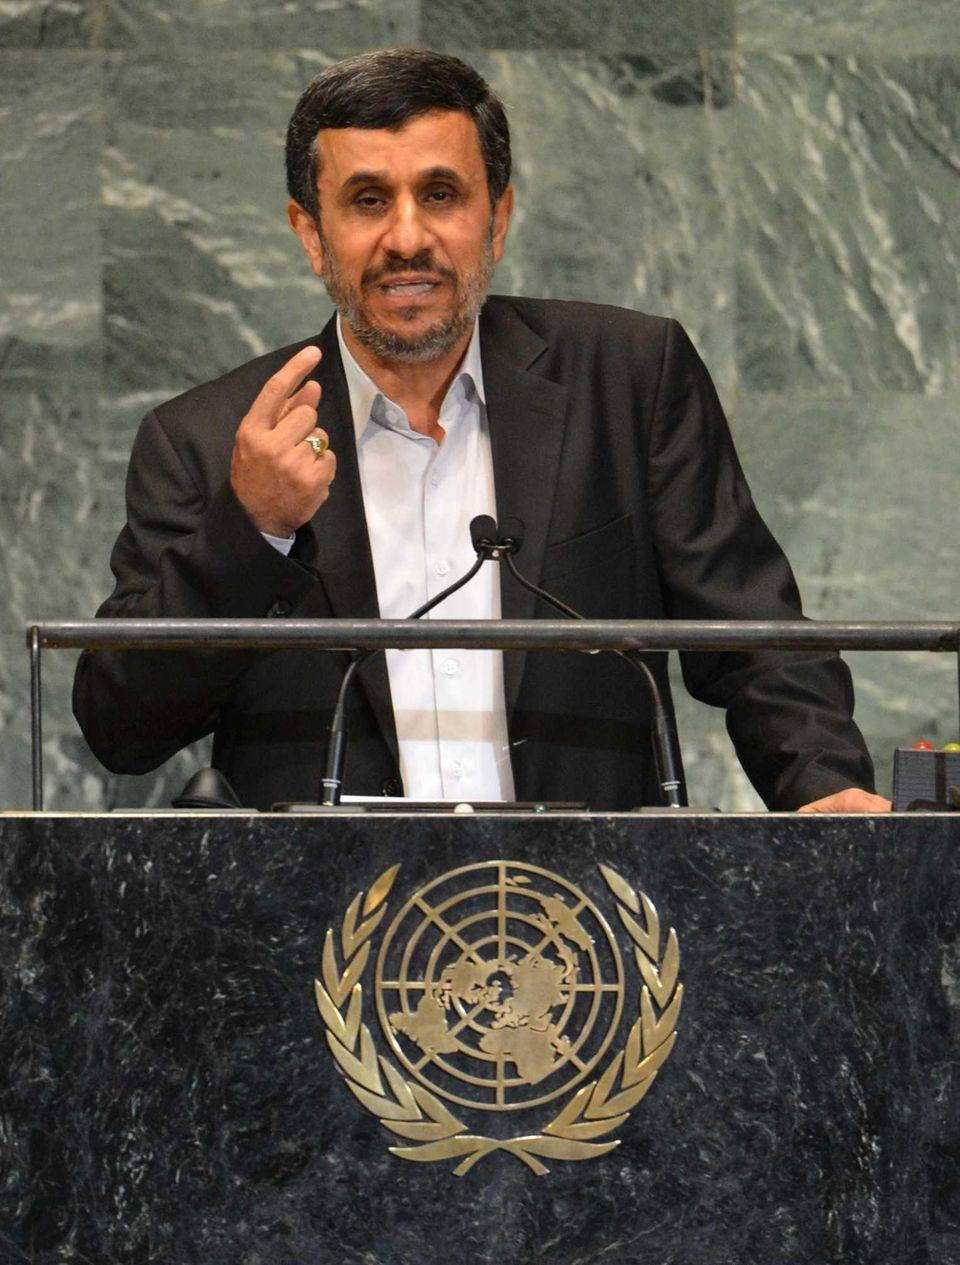 Mahmoud Ahmadinejad, President of the Islamic Republic of